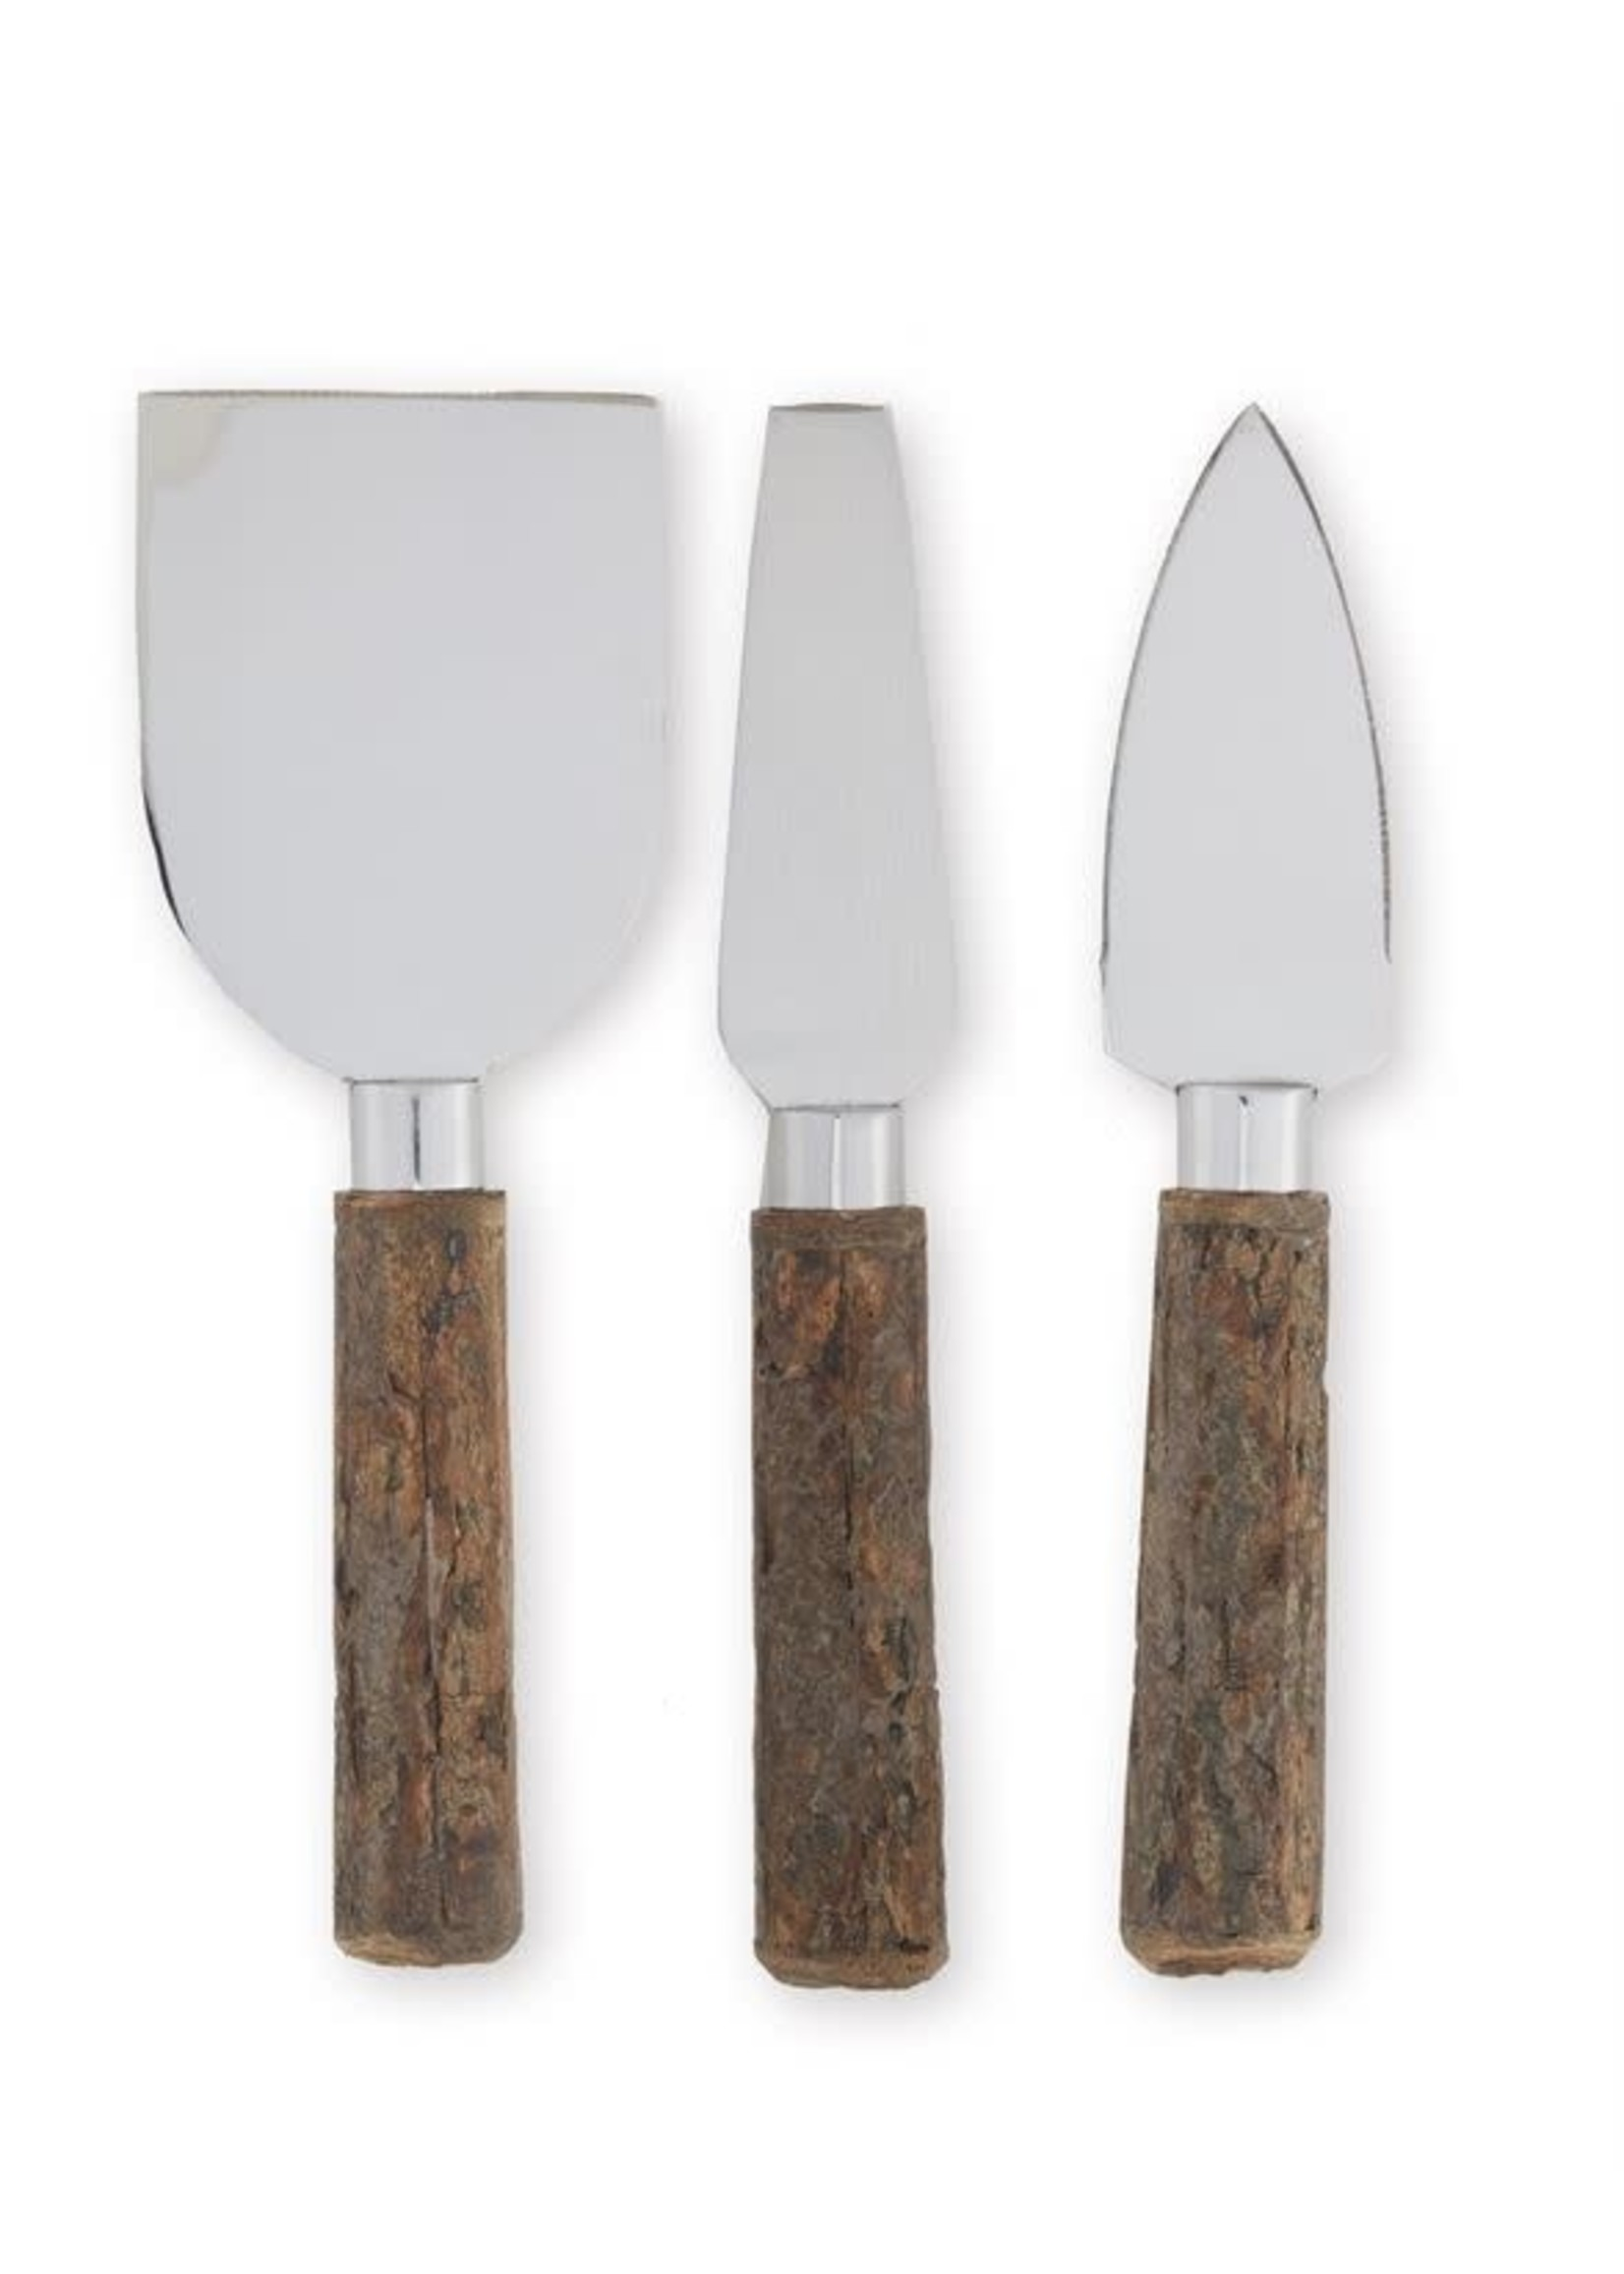 BARK EDGE CHEESE KNIVES